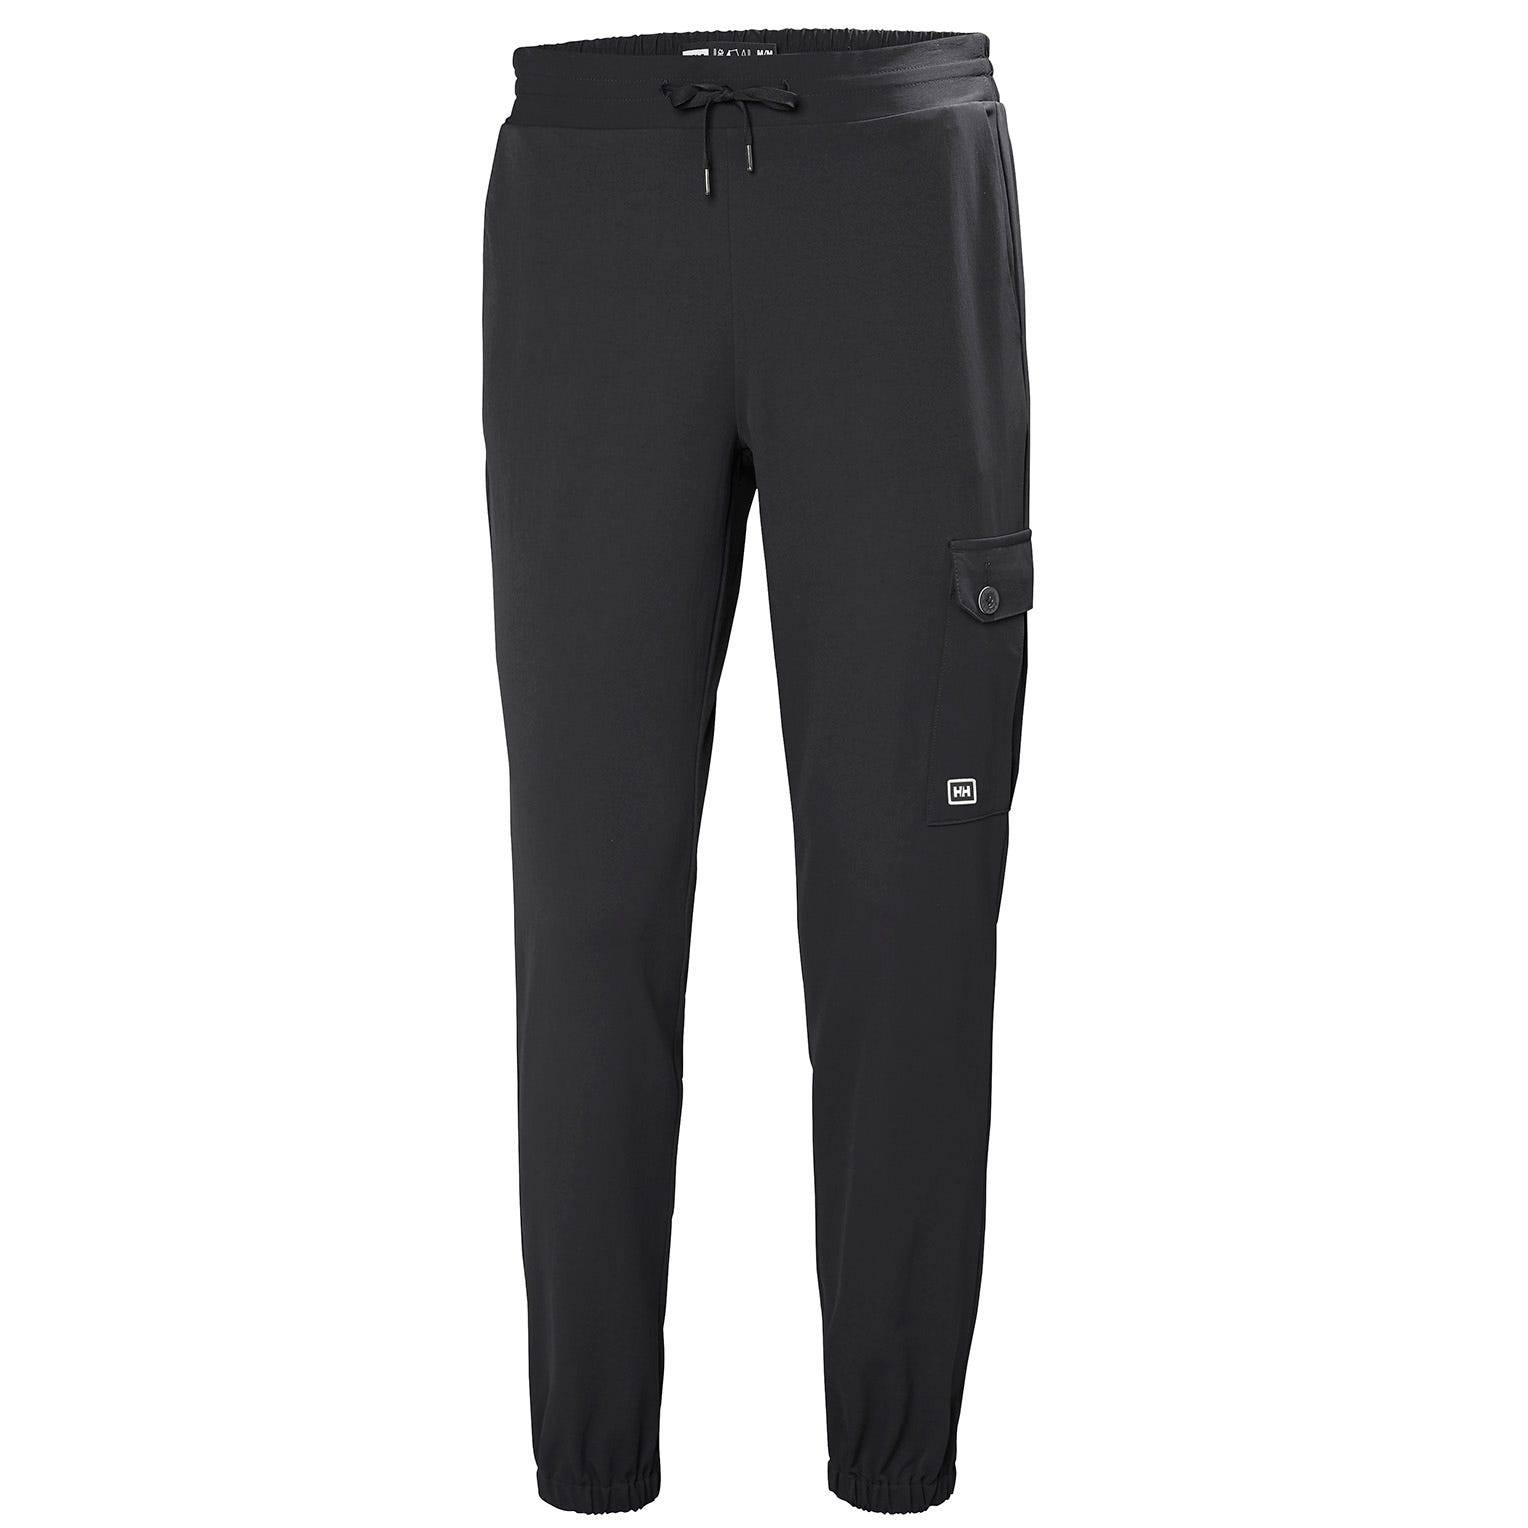 Helly Hansen W Campfire Pants Womens Hiking Pant Black XL